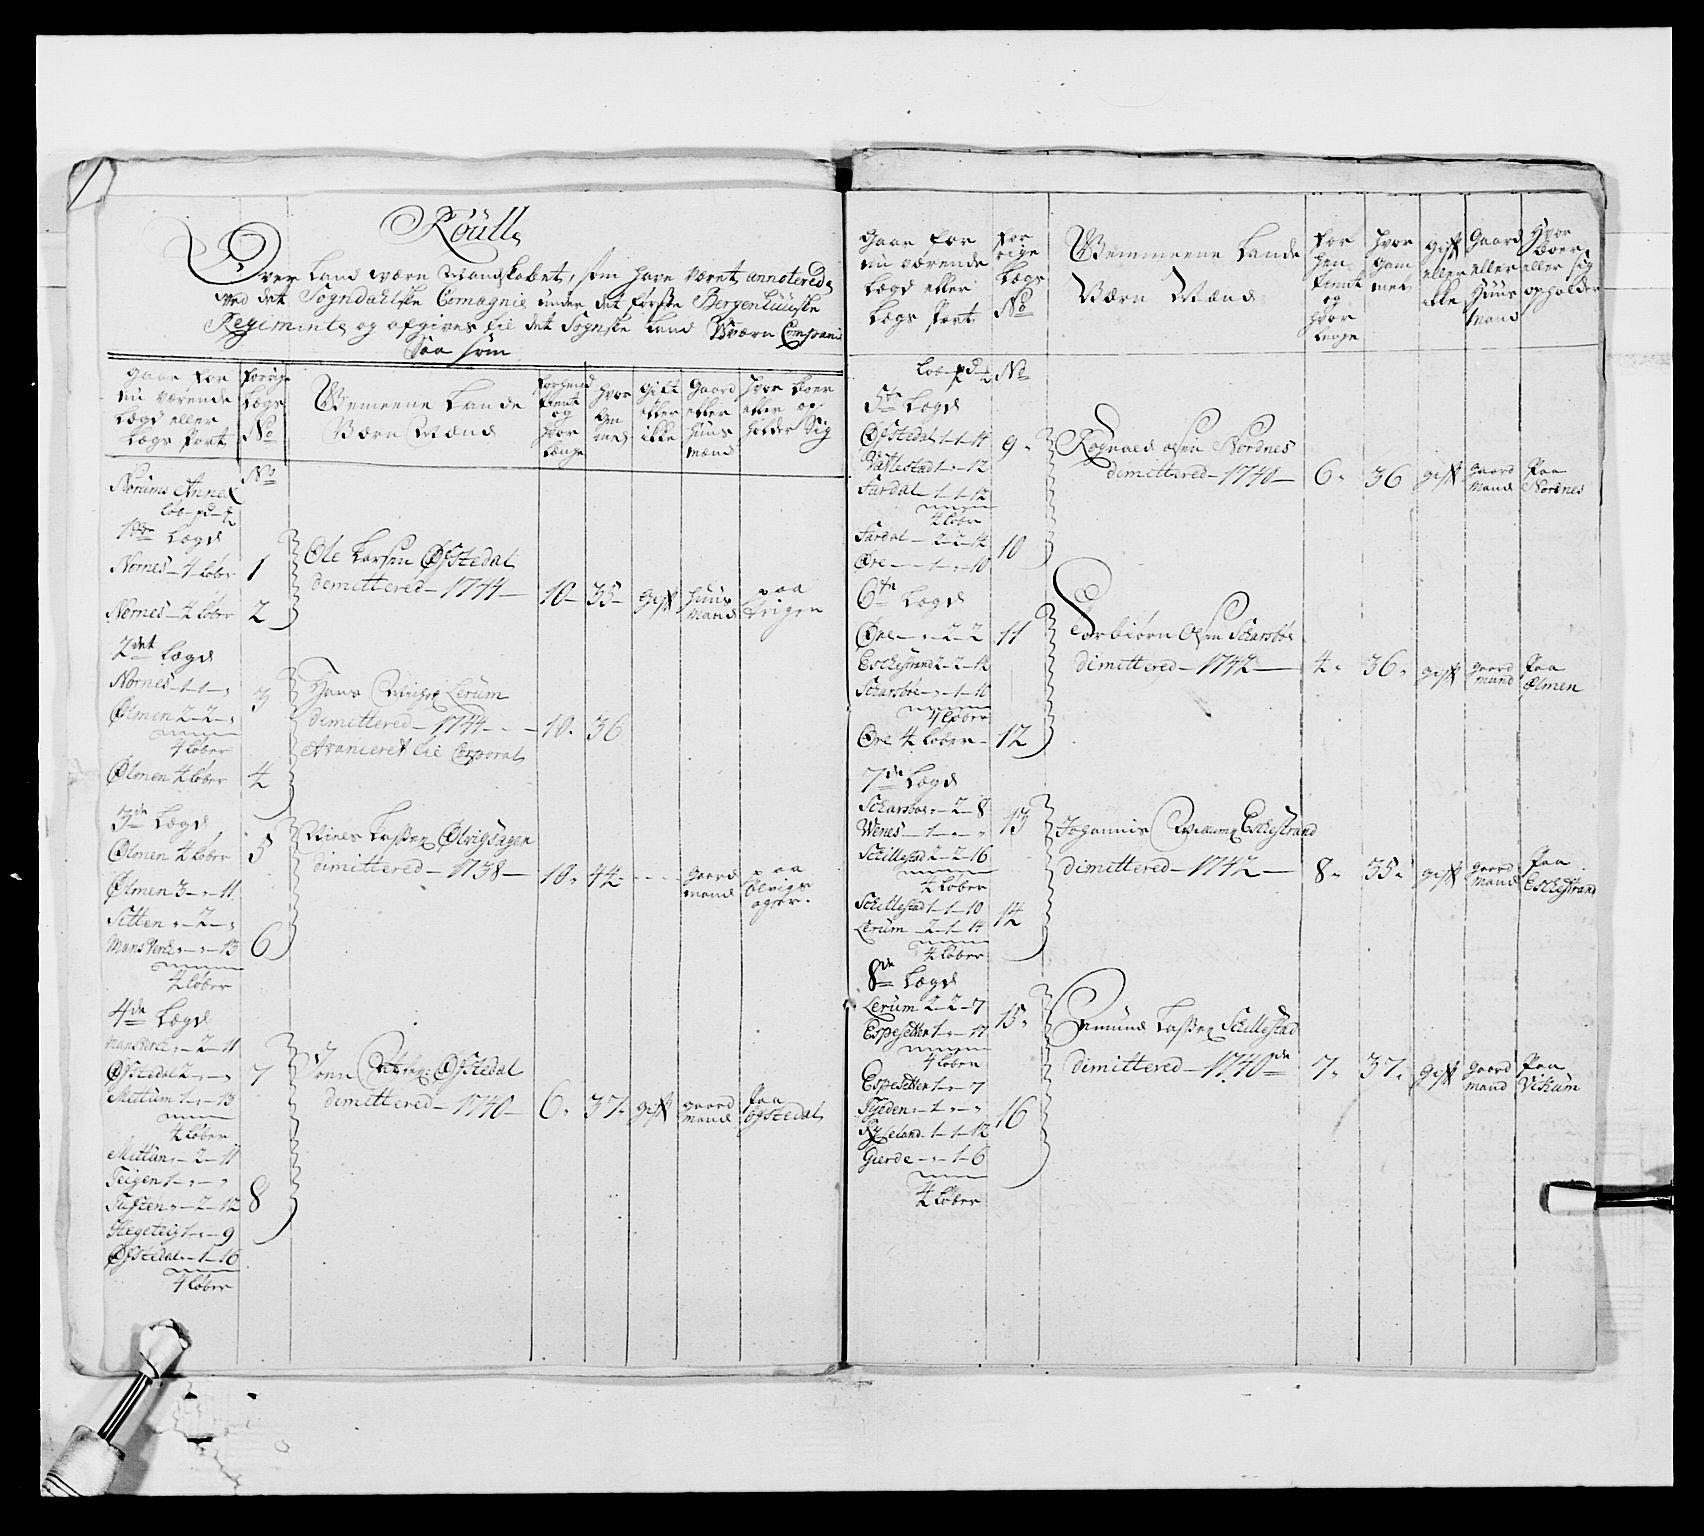 RA, Kommanderende general (KG I) med Det norske krigsdirektorium, E/Ea/L0517: 1. Bergenhusiske regiment, 1742-1756, s. 48